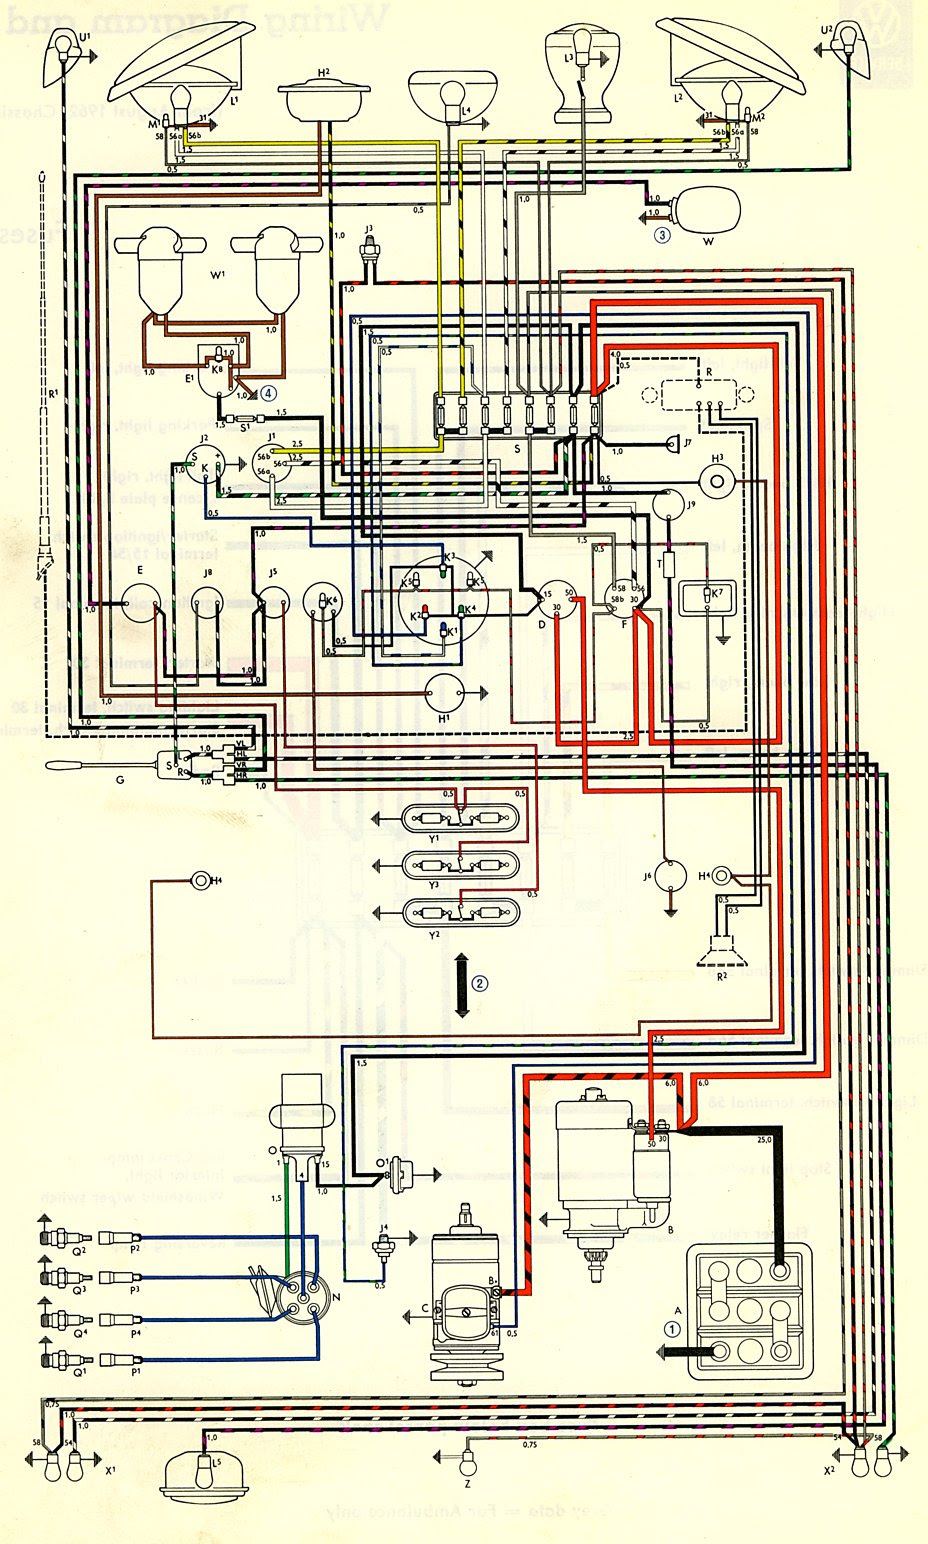 Diagram Bluebird Bus Wiring Diagram Full Version Hd Quality Wiring Diagram Diagramsceron Caditwergi It